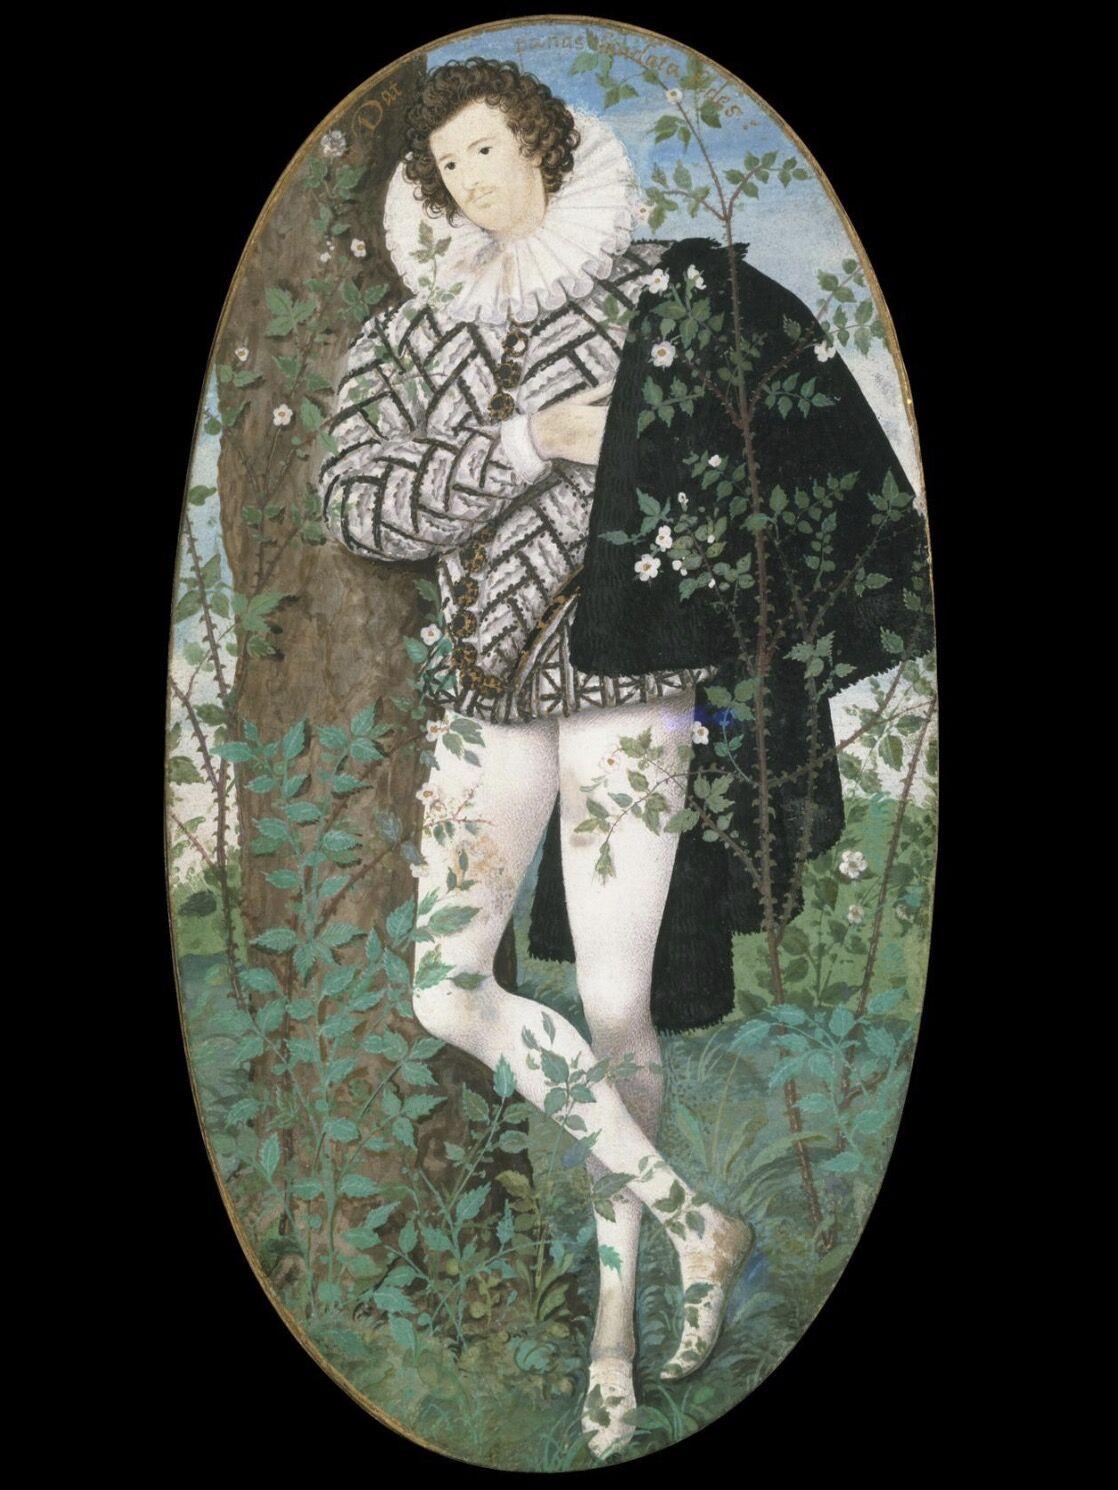 Nicholas Hillard, Young Man among Roses, ca. 1587. © The Victoria and Albert Museum